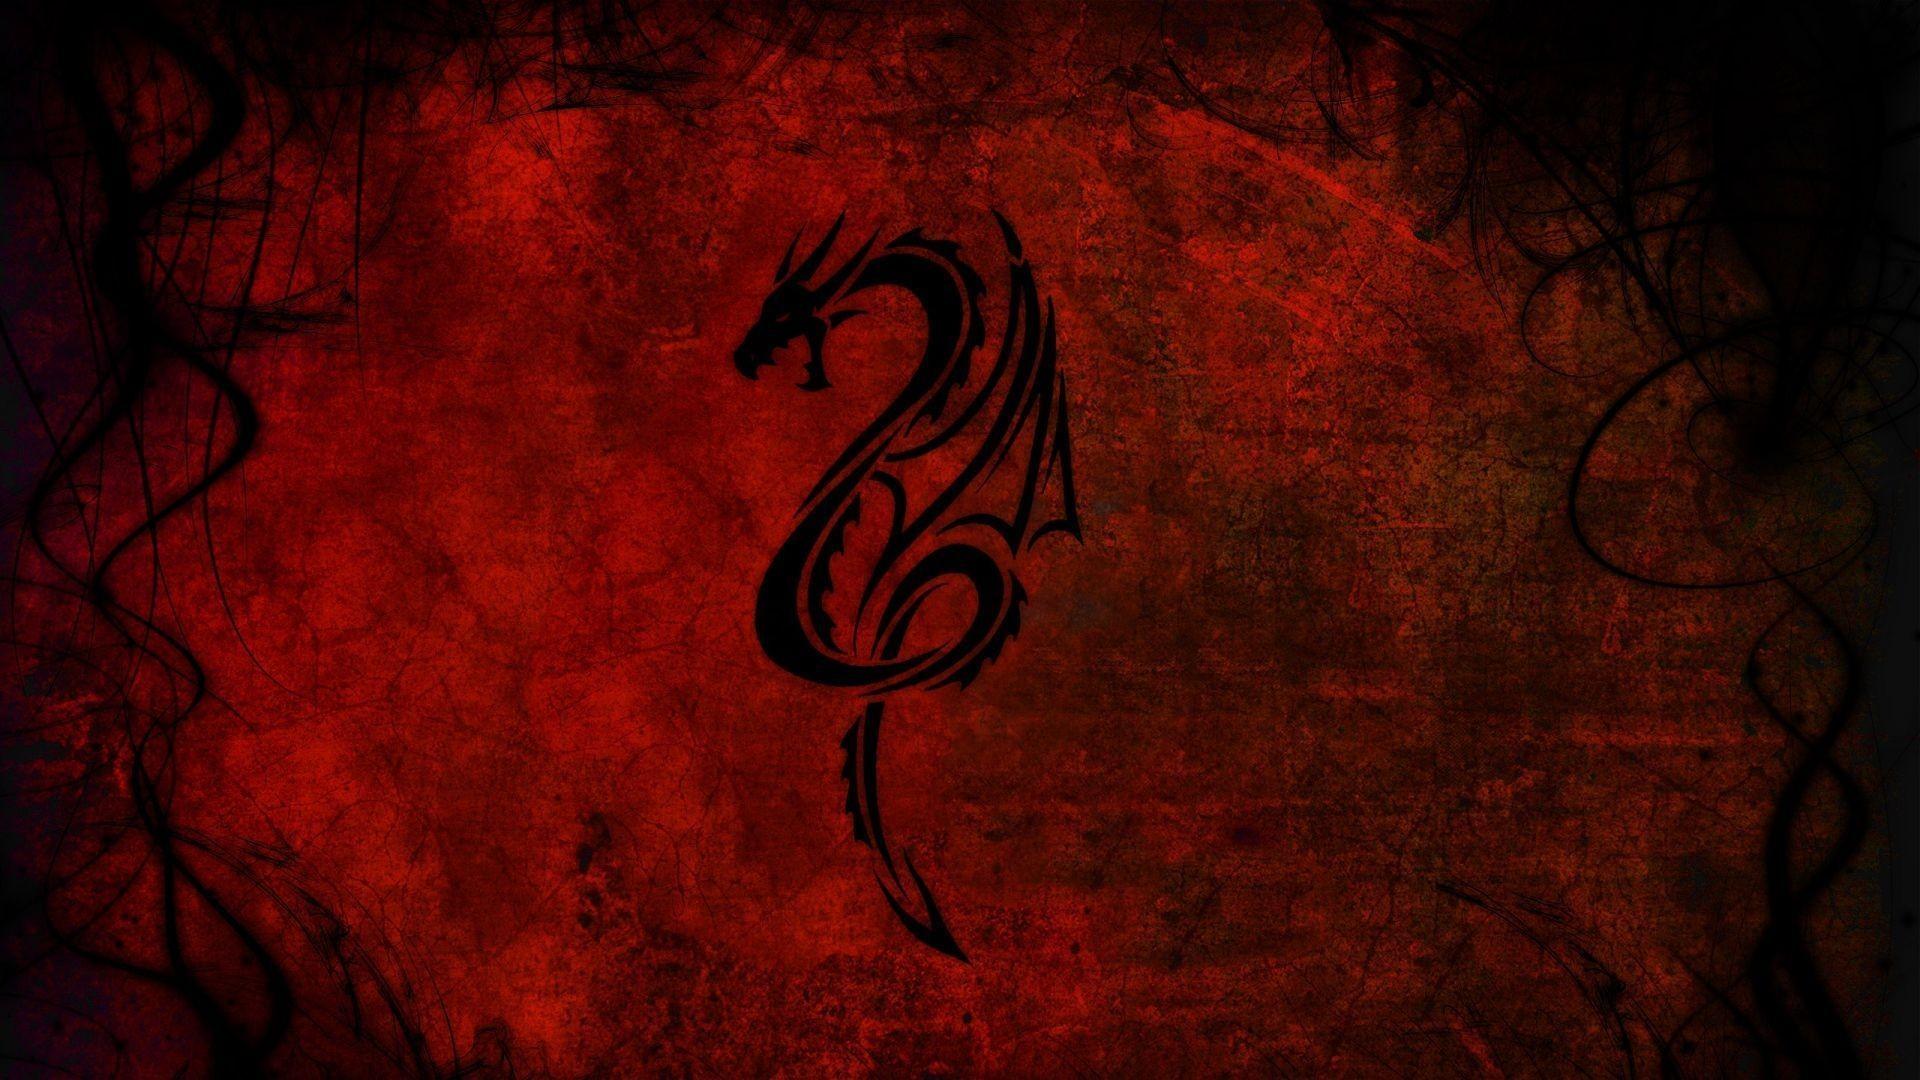 Download Wallpaper Dragon, Pattern, Red, Black Full HD .